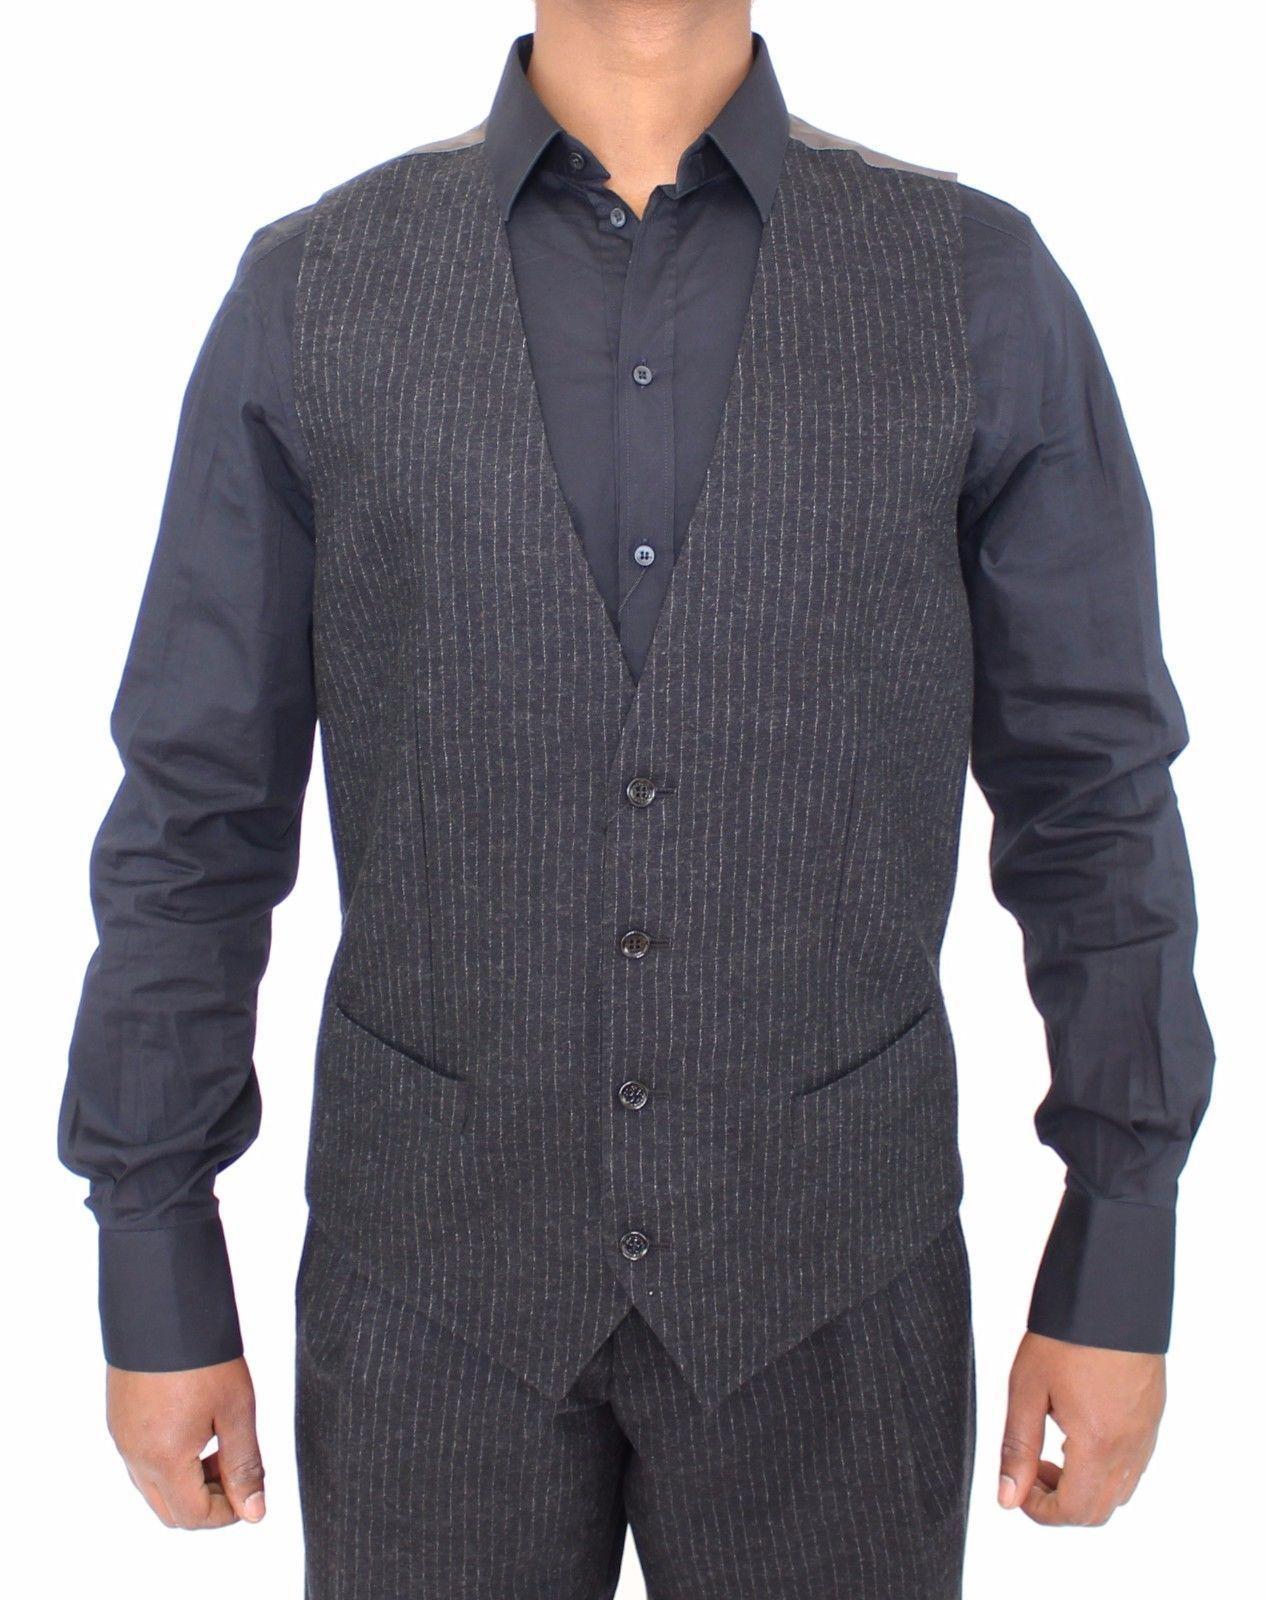 Dolce & Gabbana Gray Striped Wool Dress Vest Gilet